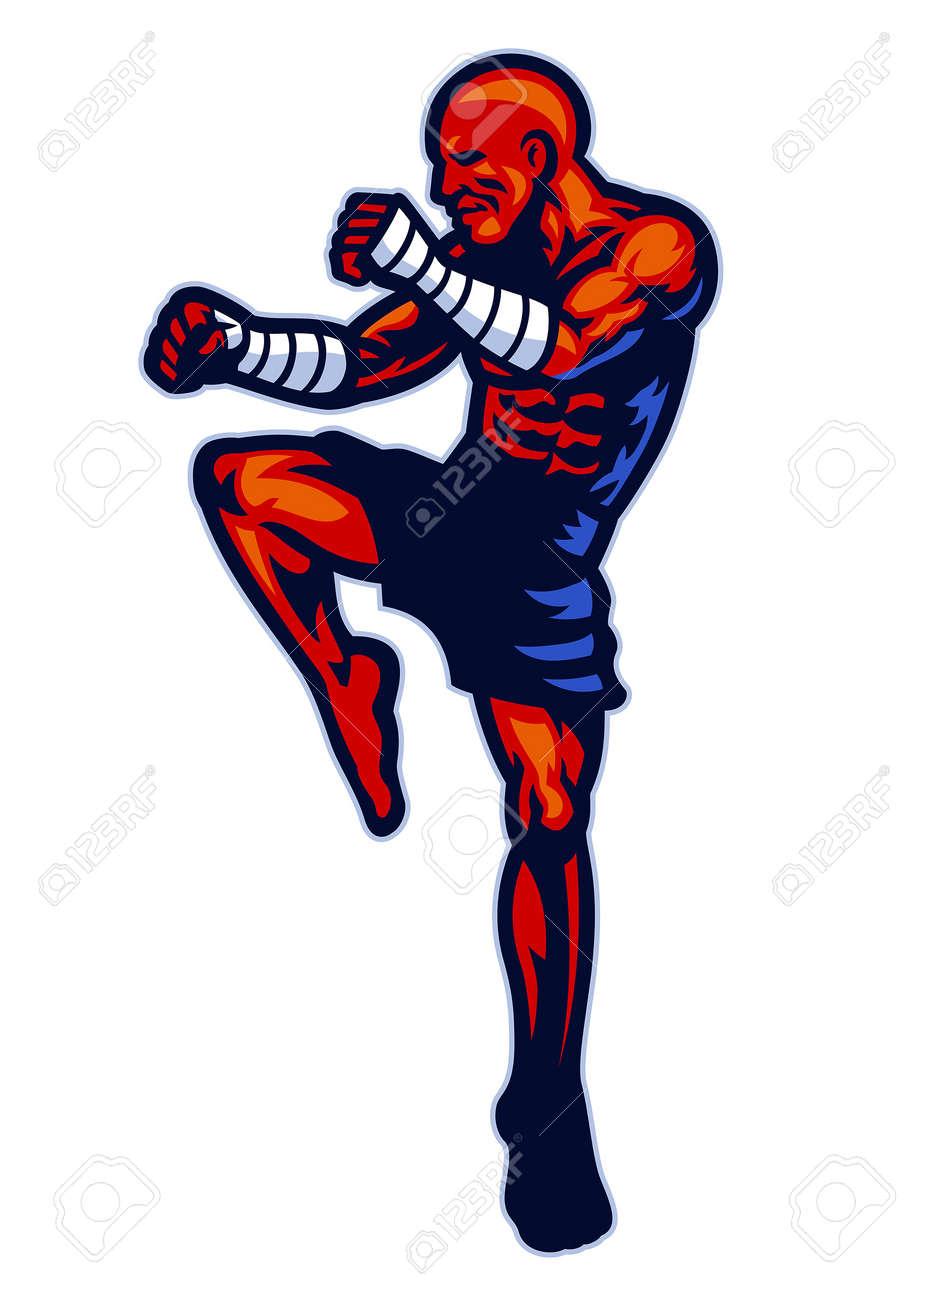 vector of muay thai fighter mascot pose - 165301218